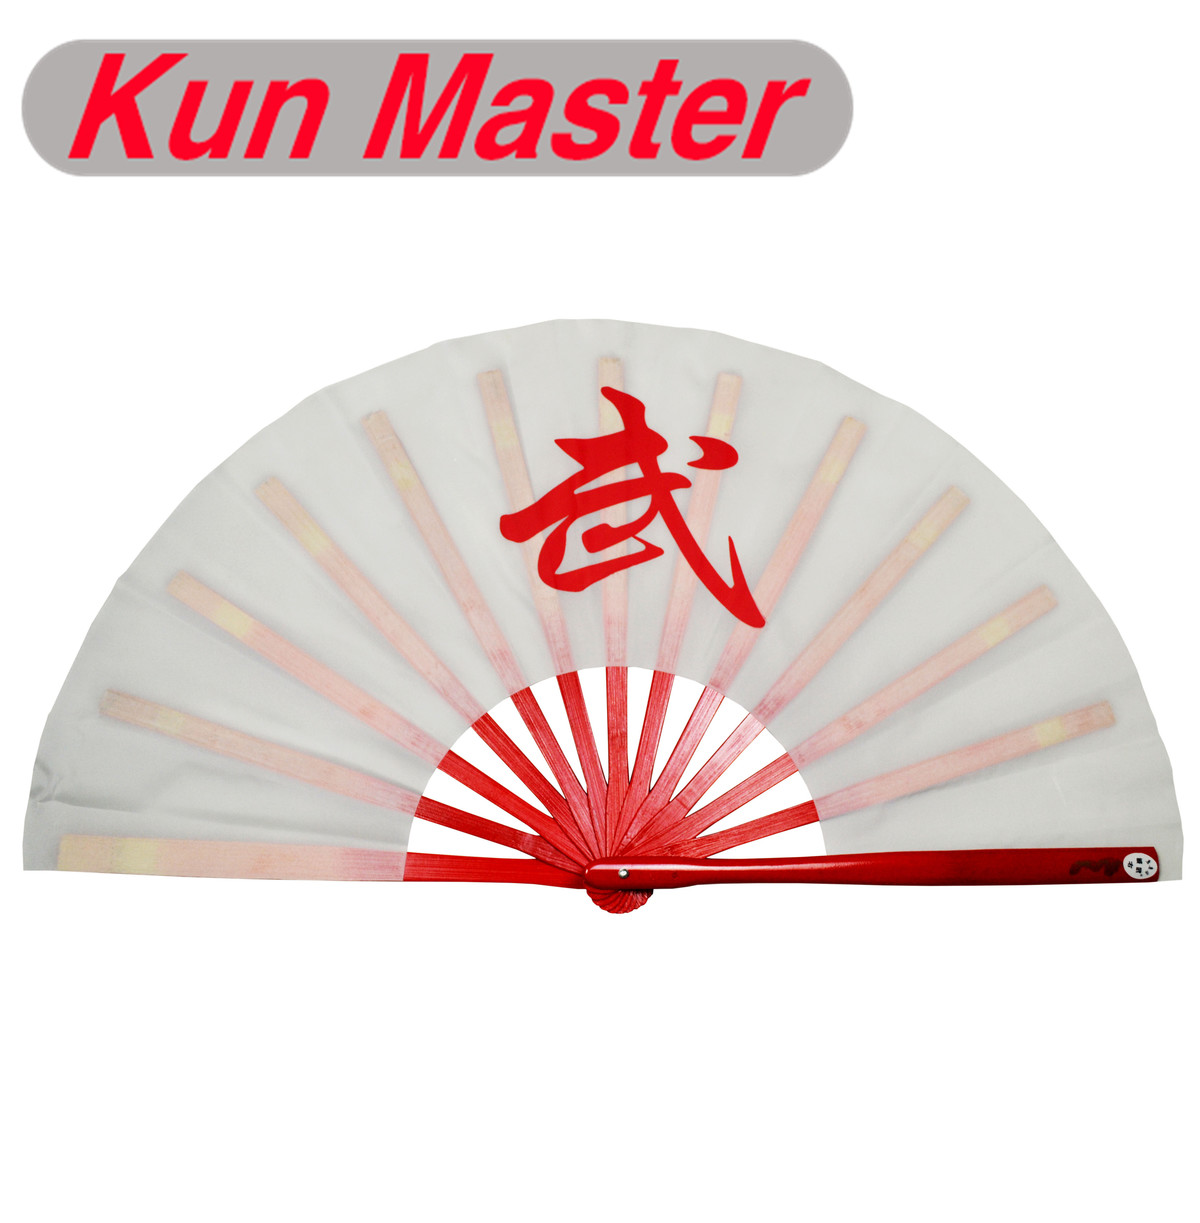 De bambú Kung Fu abanico de luchas de artes marciales práctica rendimiento Fan de Wu Shu Fan China palabra Kung Fu (rojo blanco) Trajes tradicionales chinos para hombres, Chaqueta de traje Tang Wu Shu Tai Chi Shaolin Kung Fu Wing Chun, camisa de manga larga, traje de ejercicios